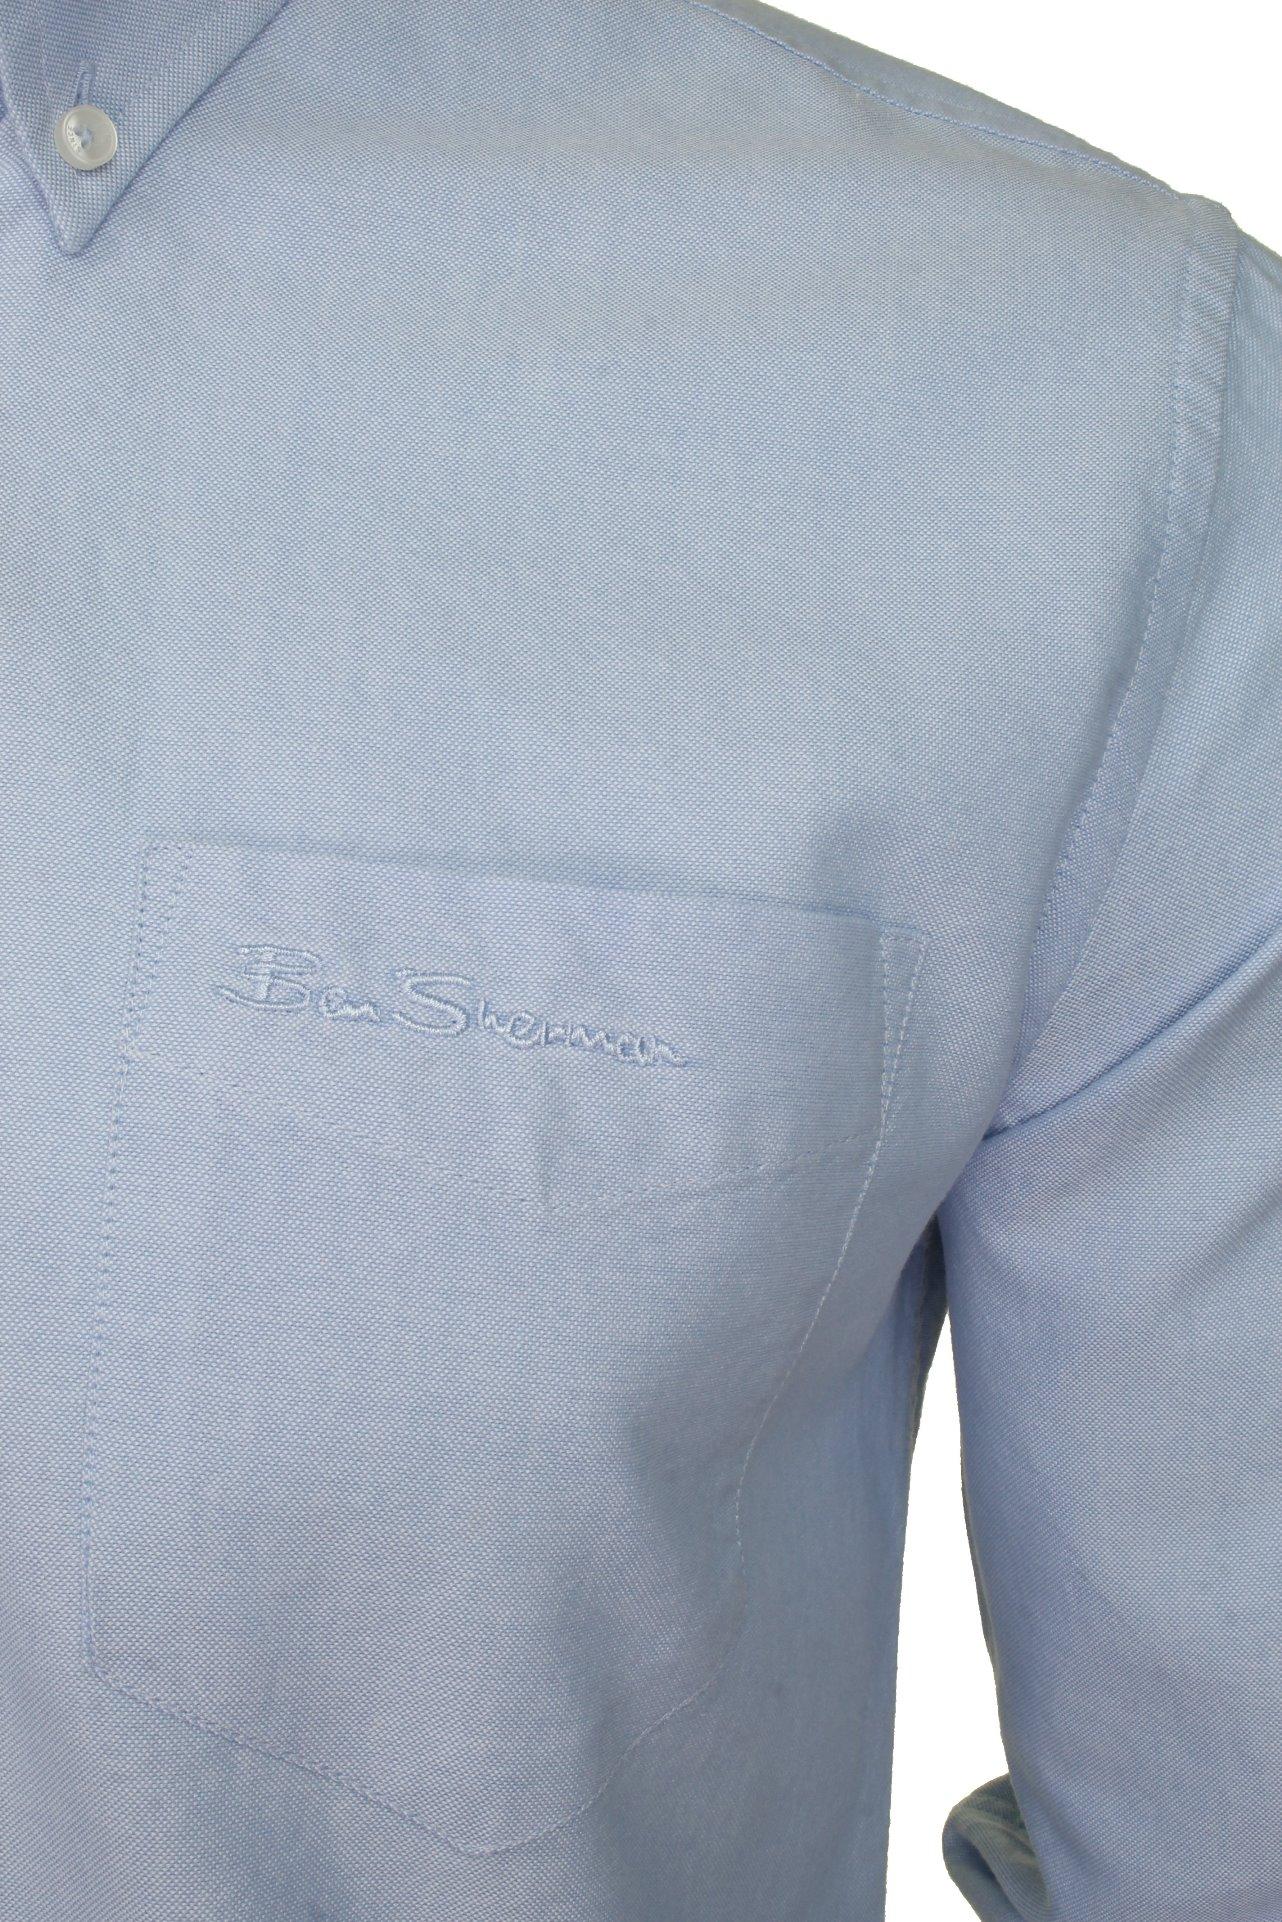 Mens-Oxford-Shirt-by-Ben-Sherman-Long-Sleeved thumbnail 33